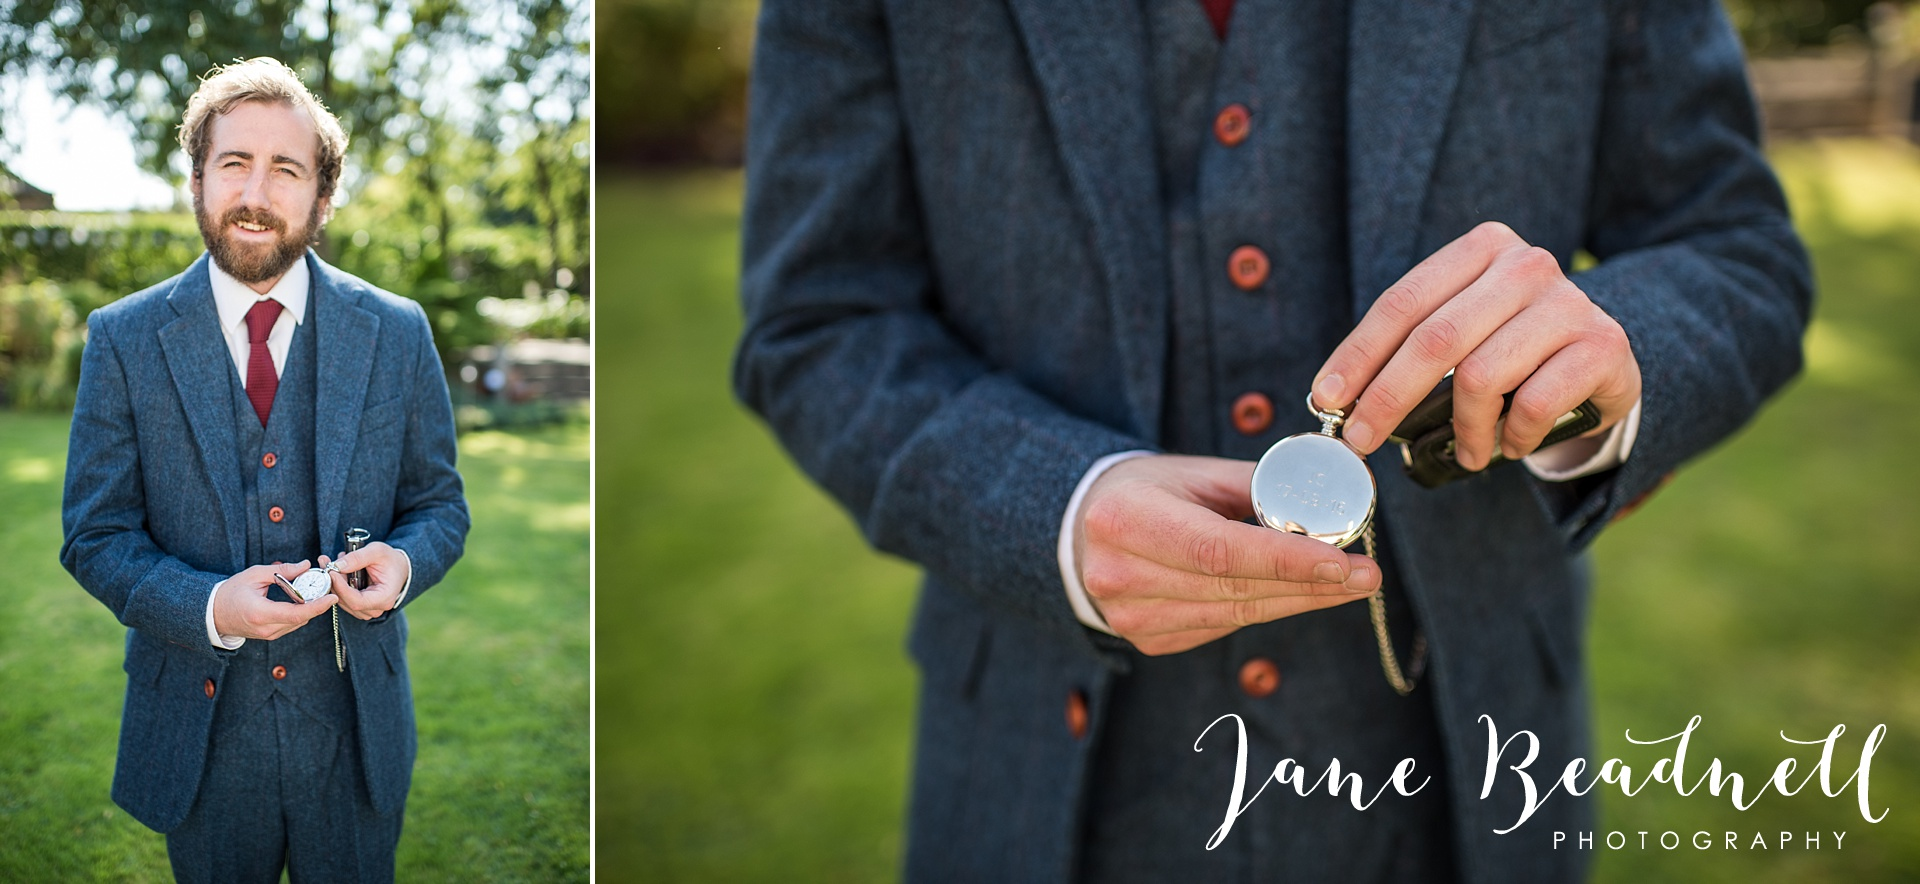 fine-art-wedding-photographer-jane-beadnell-yorkshire-wedding-photographer_0015